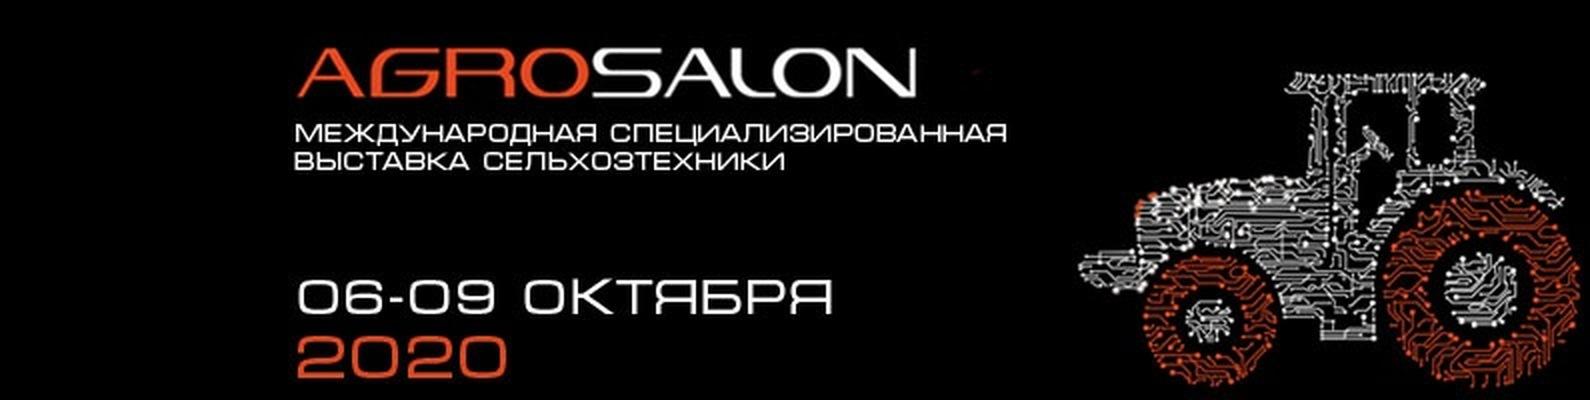 АГРОСАЛОН 2020 | ВКонтакте